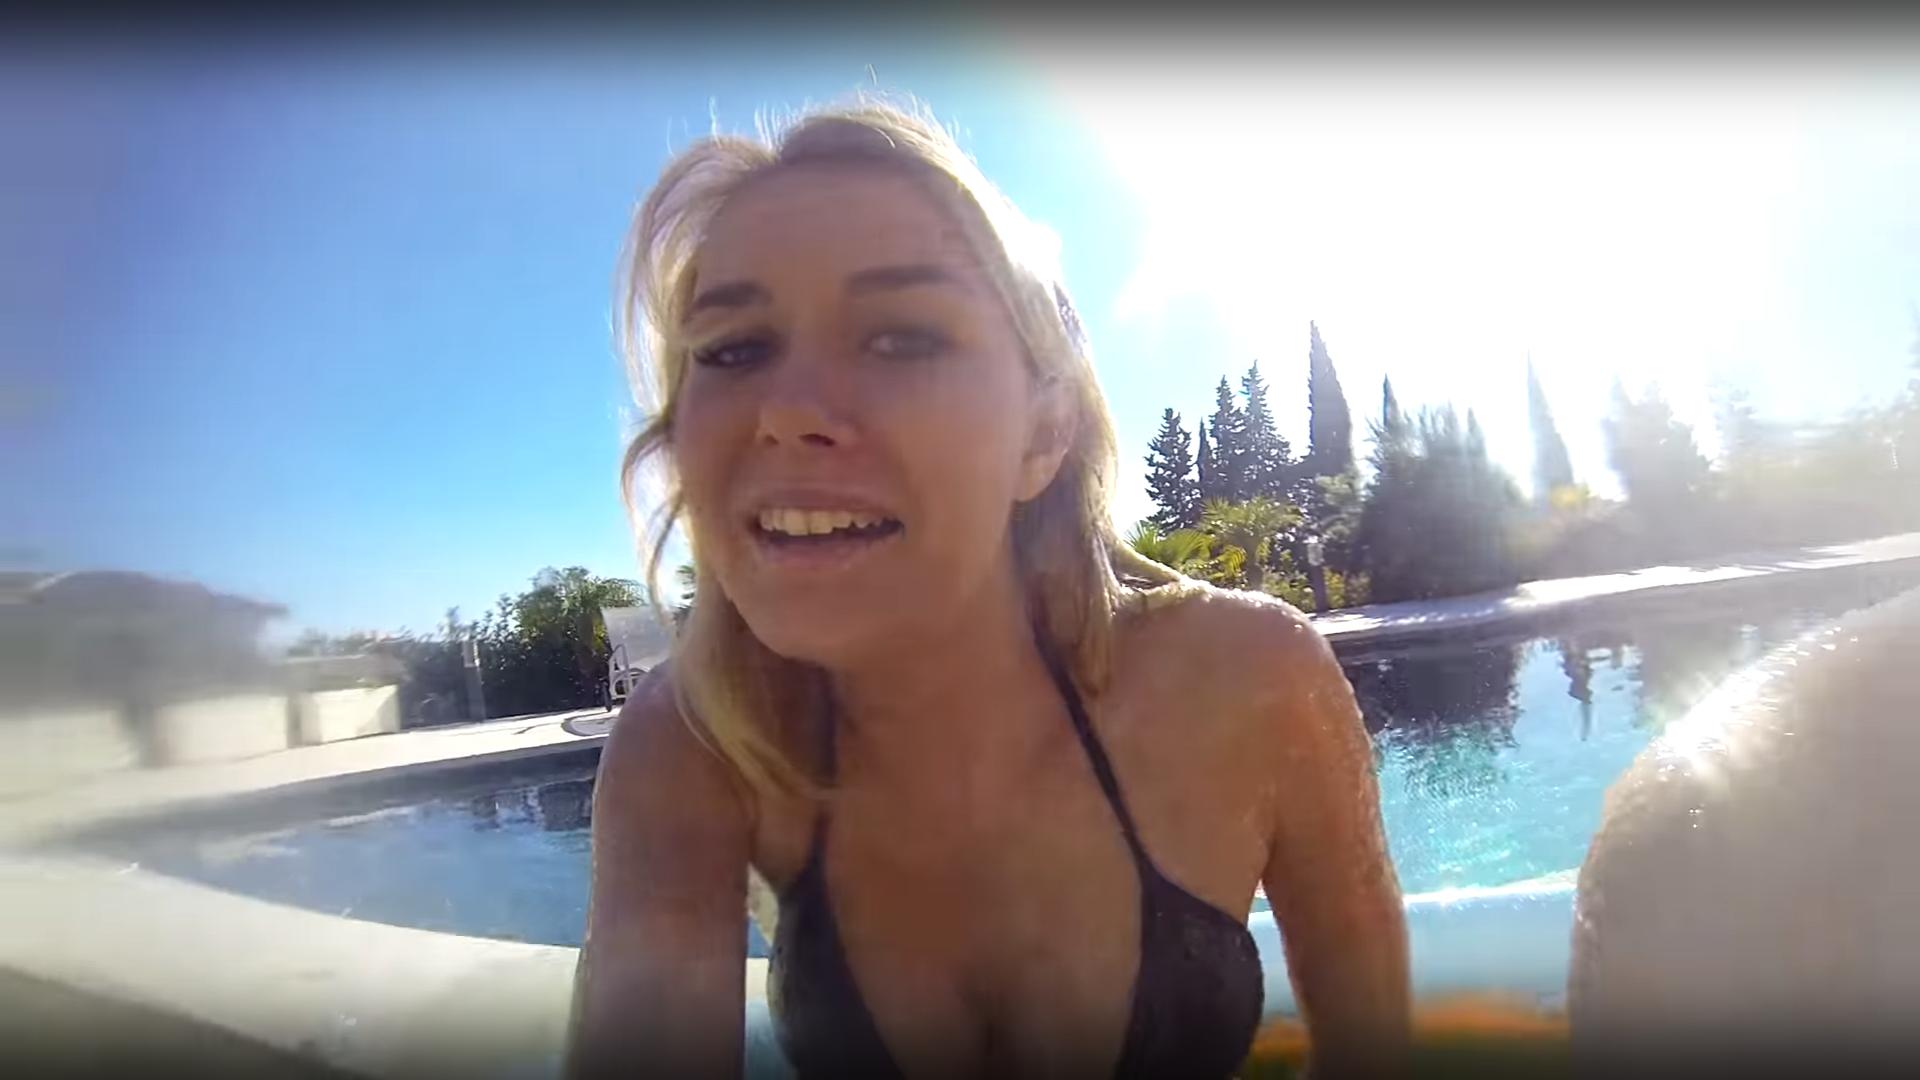 IamSanna Big Cleavage And Cameltoe (25 Pics) - Sexy Youtubers